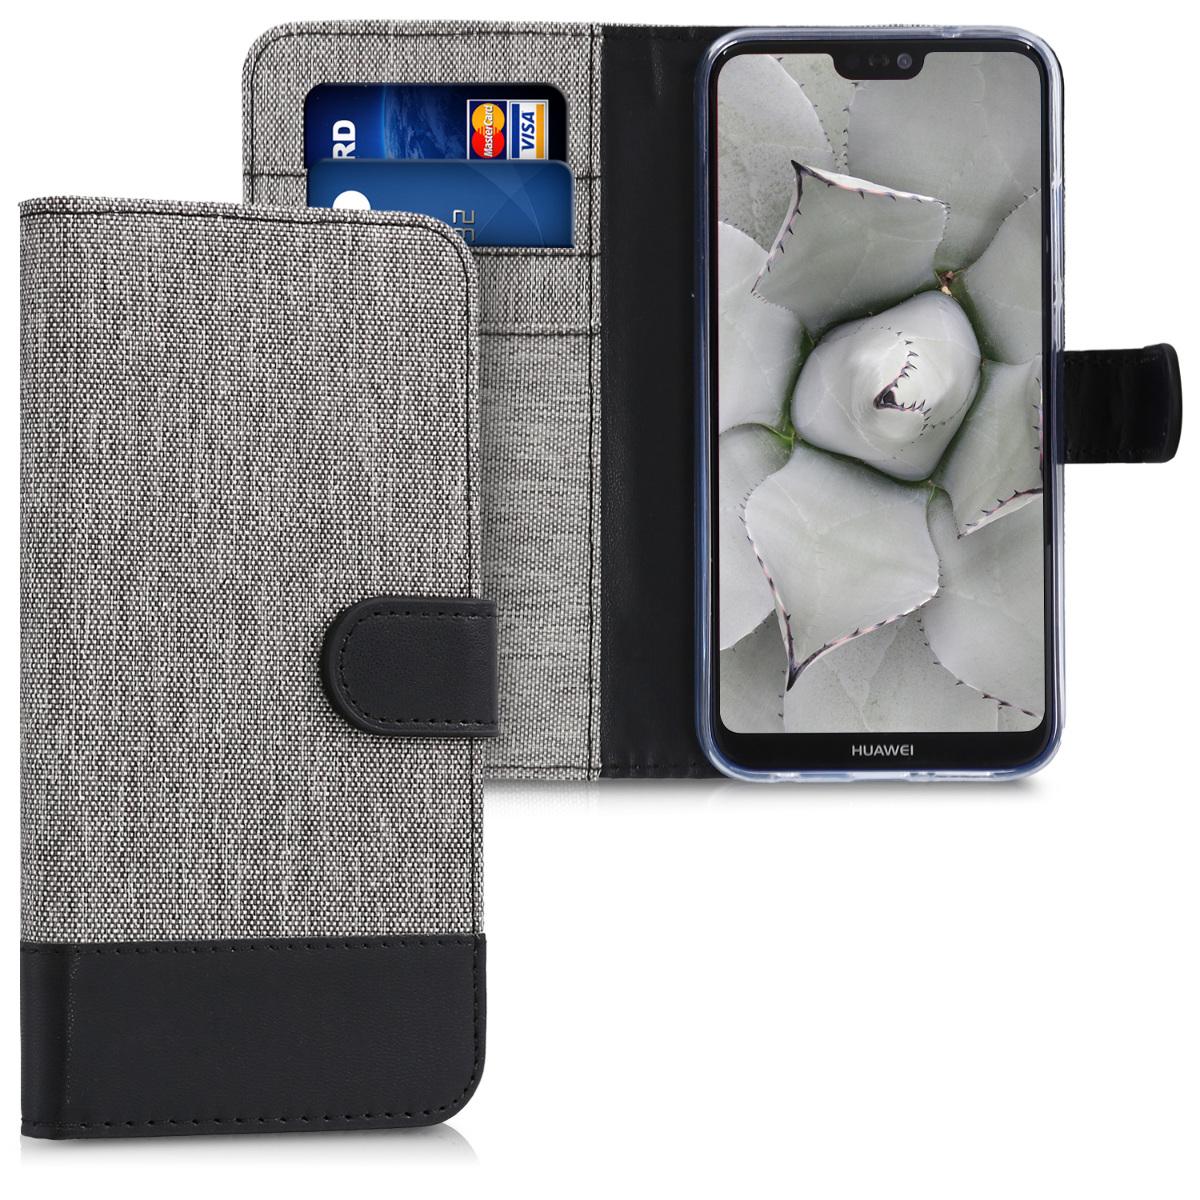 KW Θήκη Πορτοφόλι Huawei P20 Lite - Συνθετικό δέρμα - Grey / Black (44363.01)